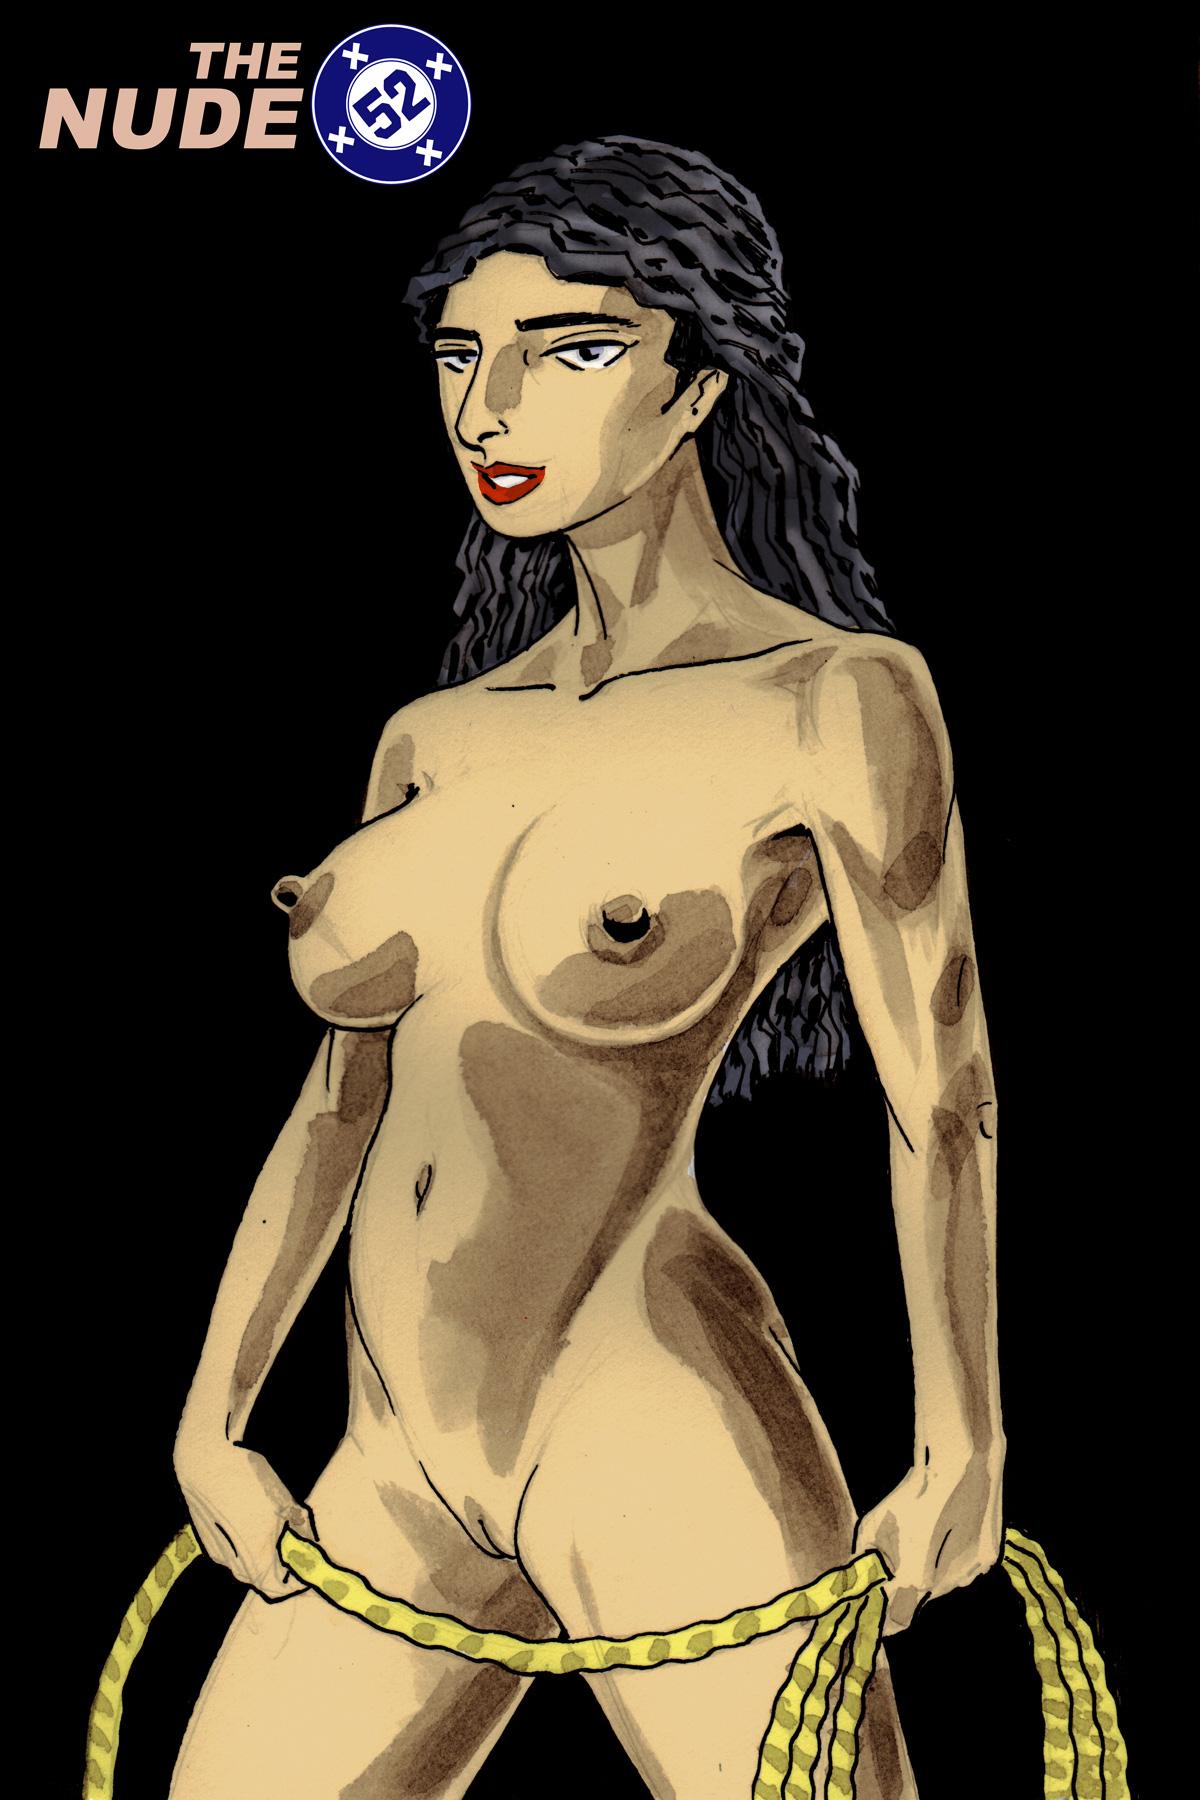 Nude52-WonderWoman